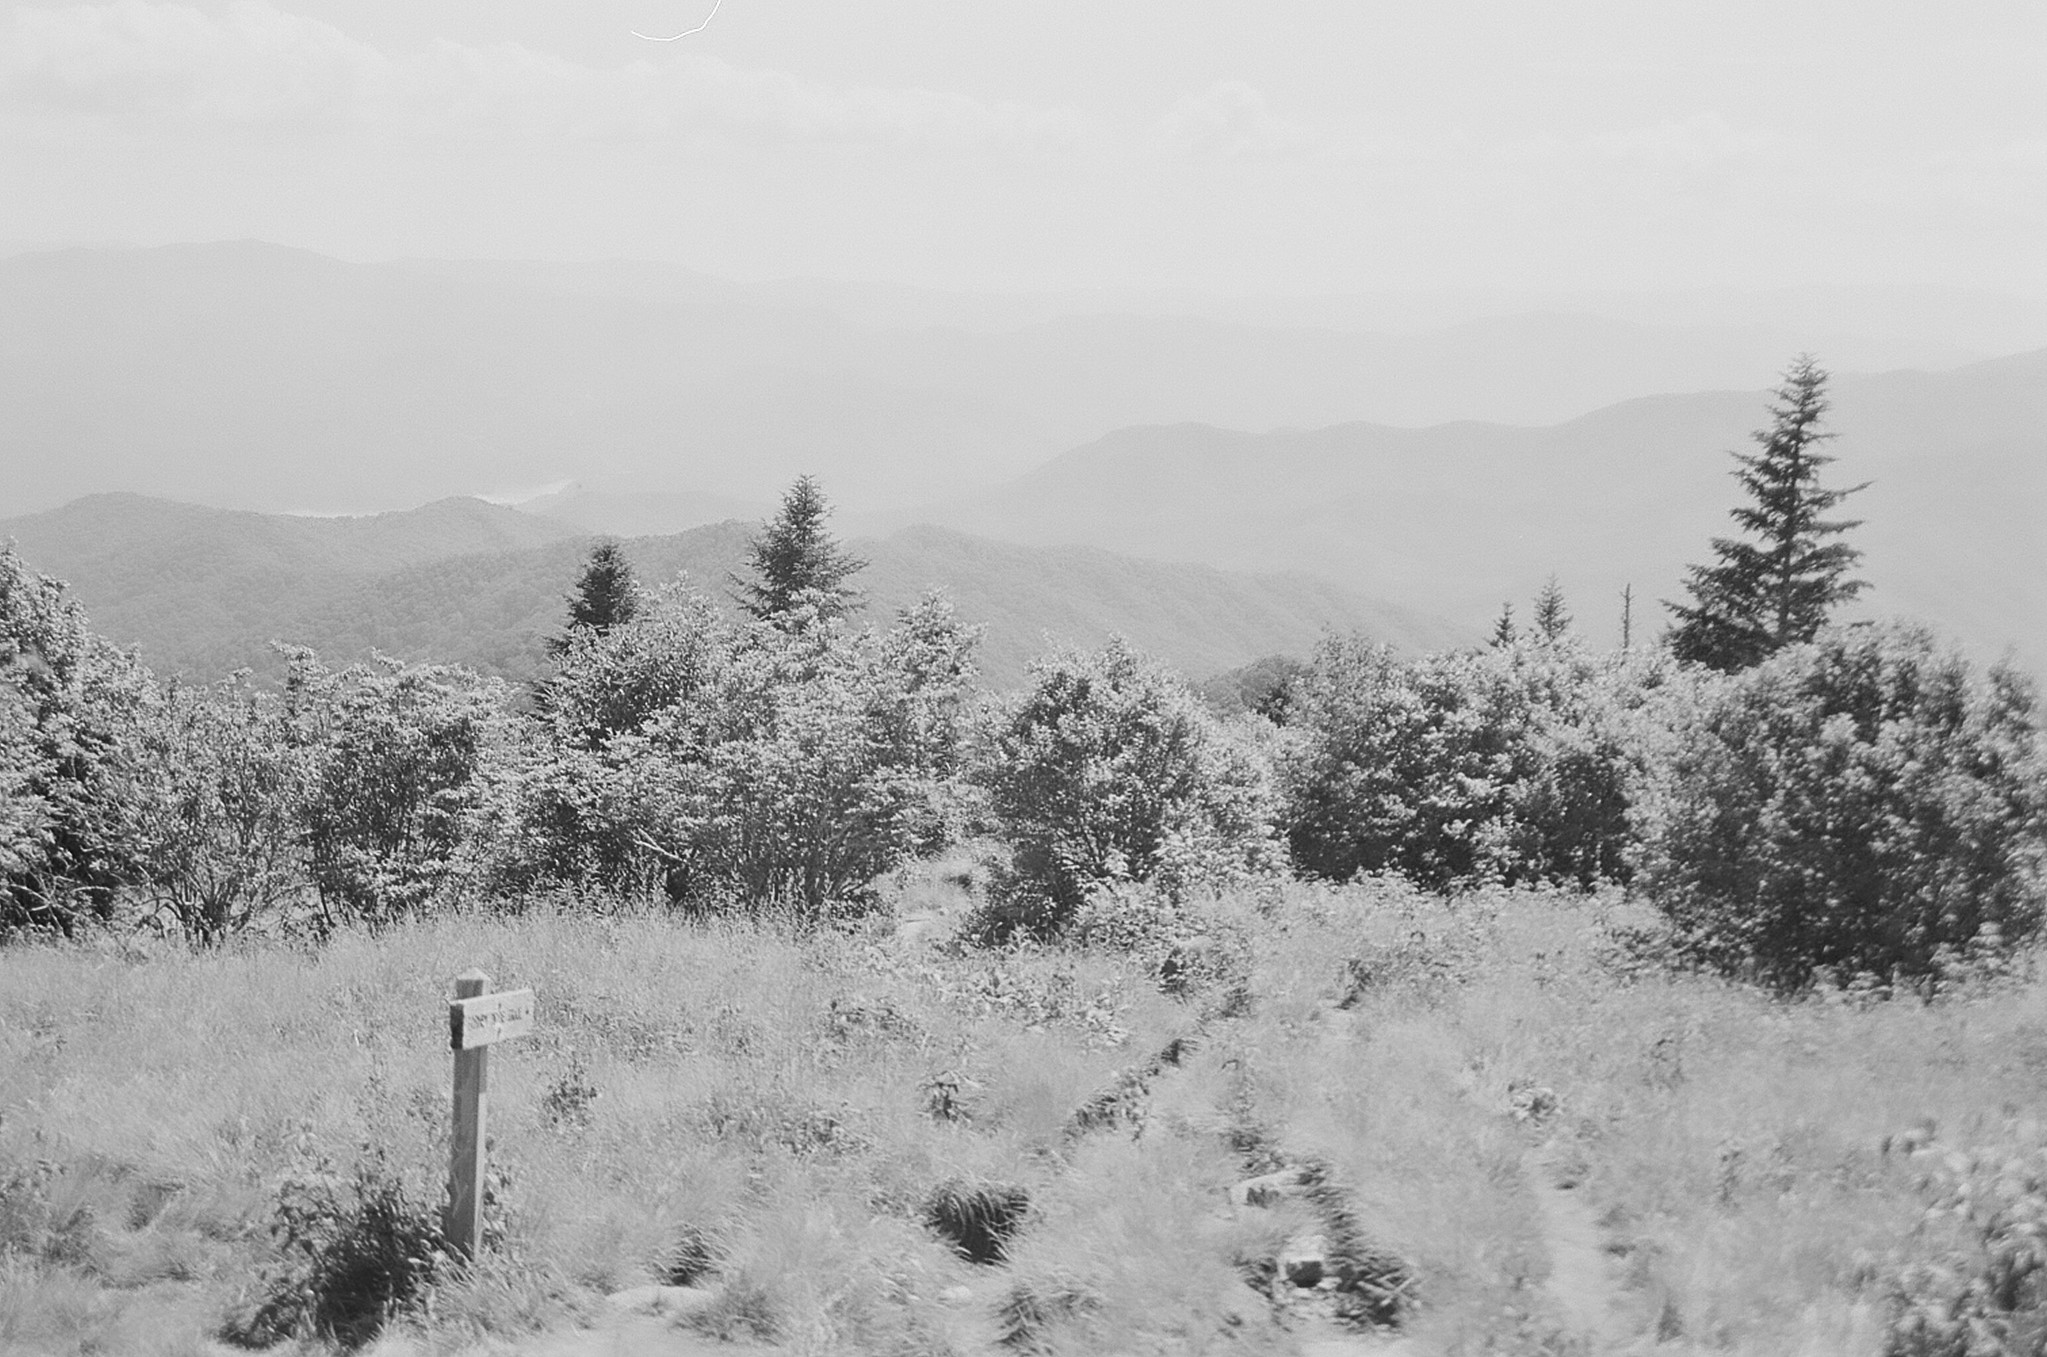 Hiking Forney Ridge Trail through Andrews Bald.